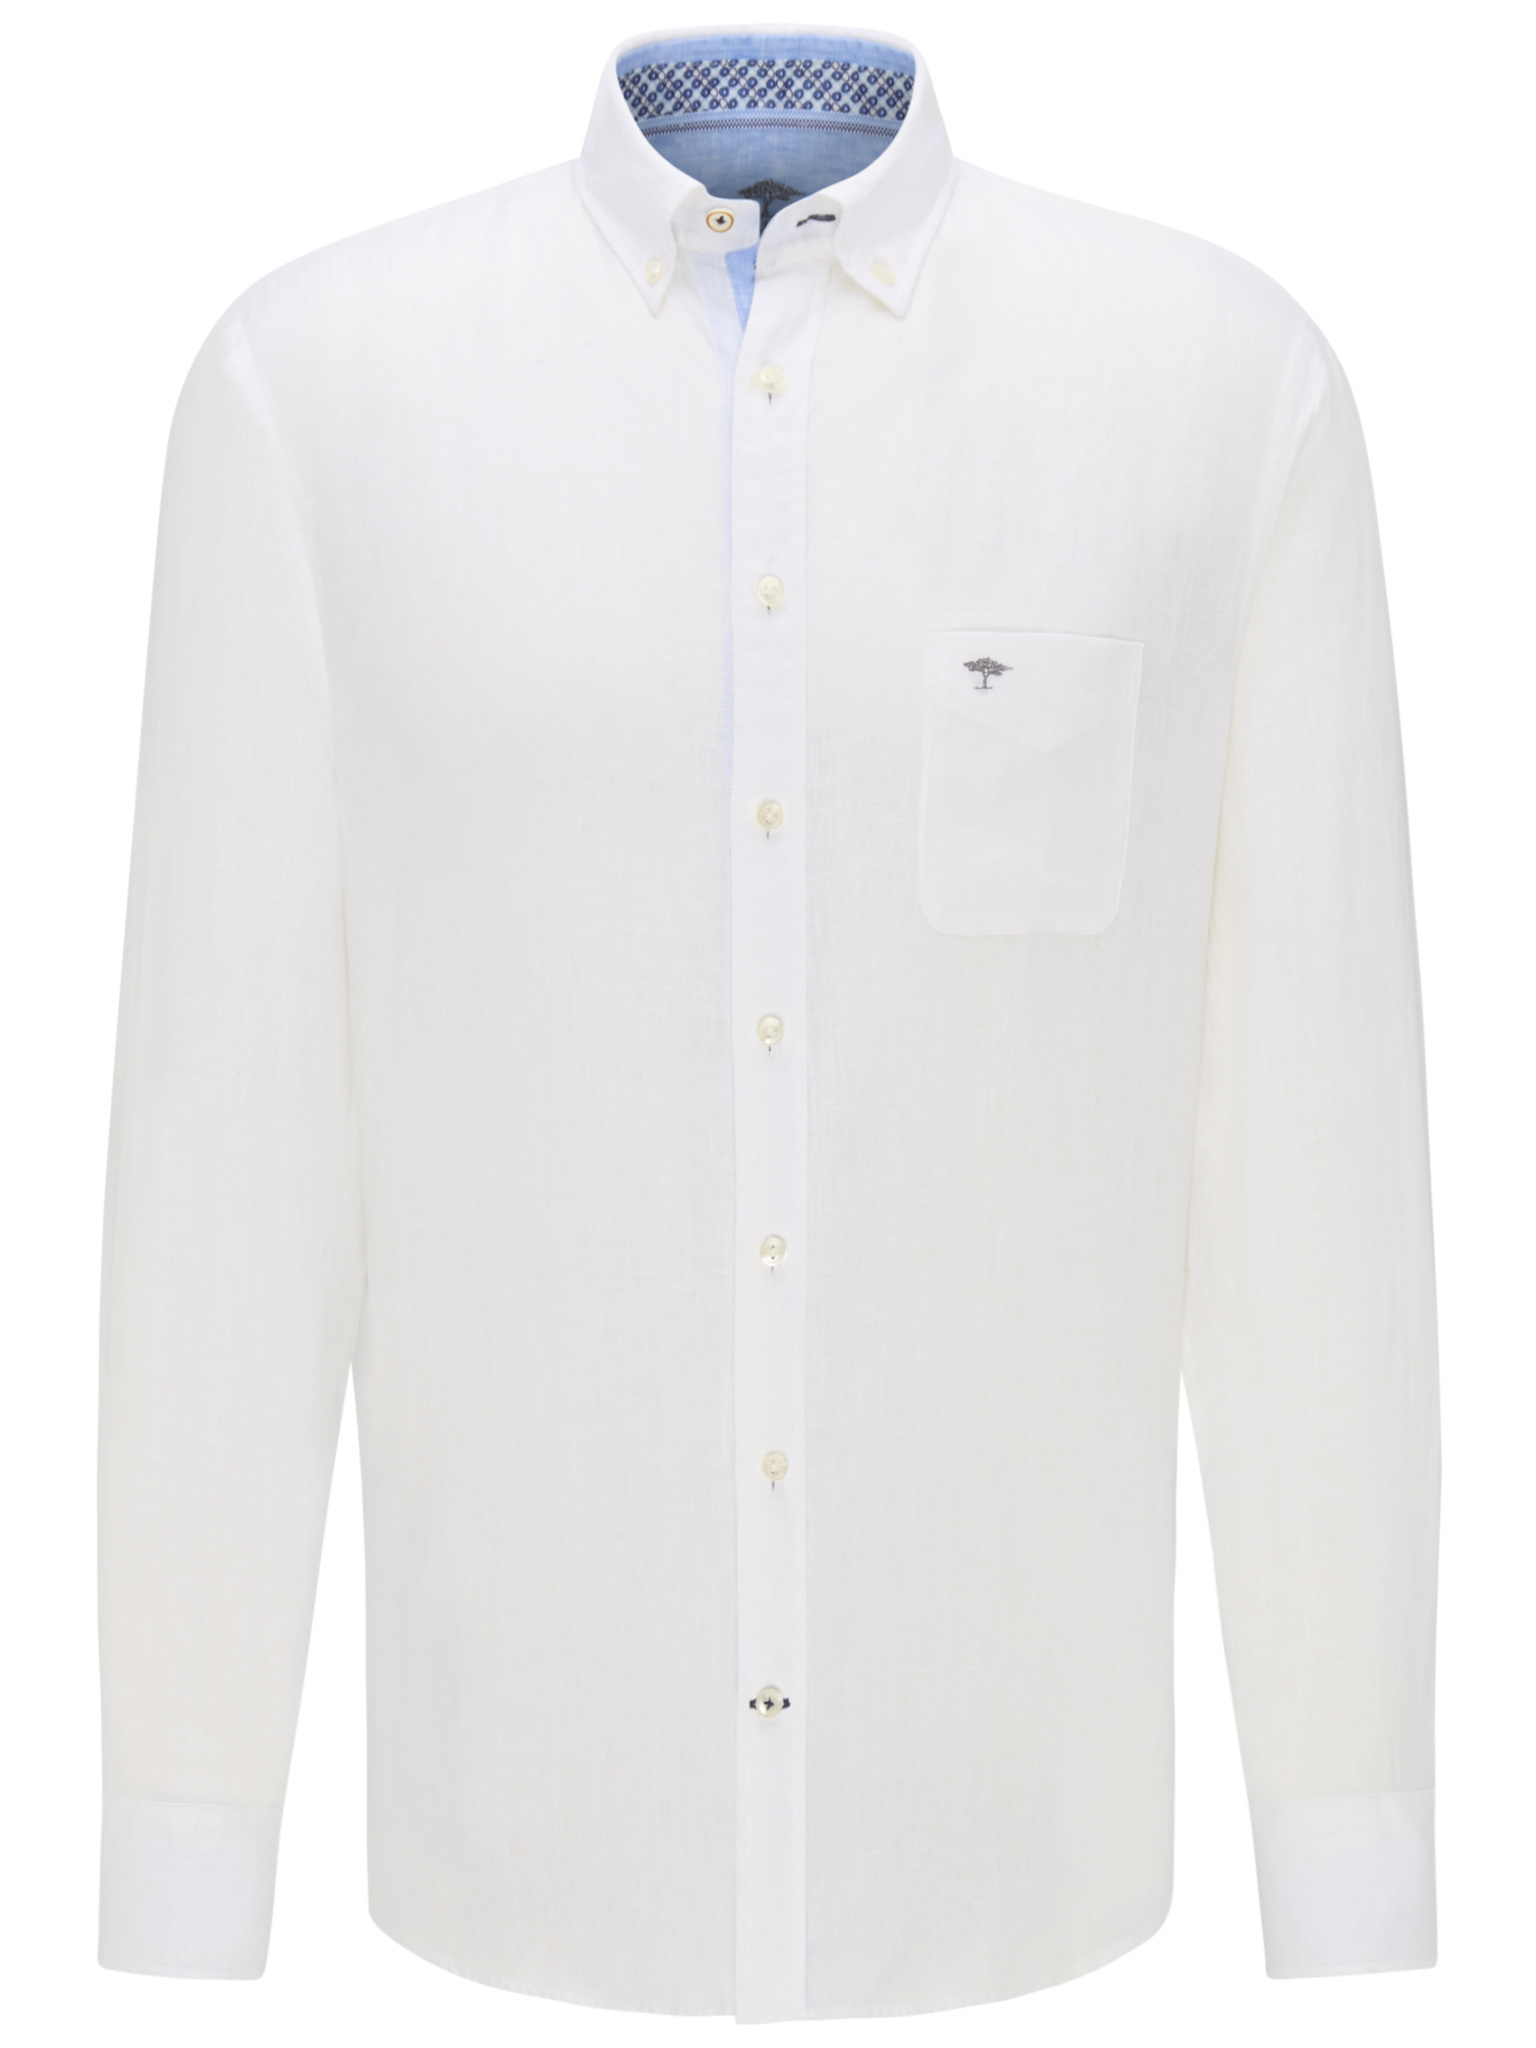 FYNCH chemise en lin-1